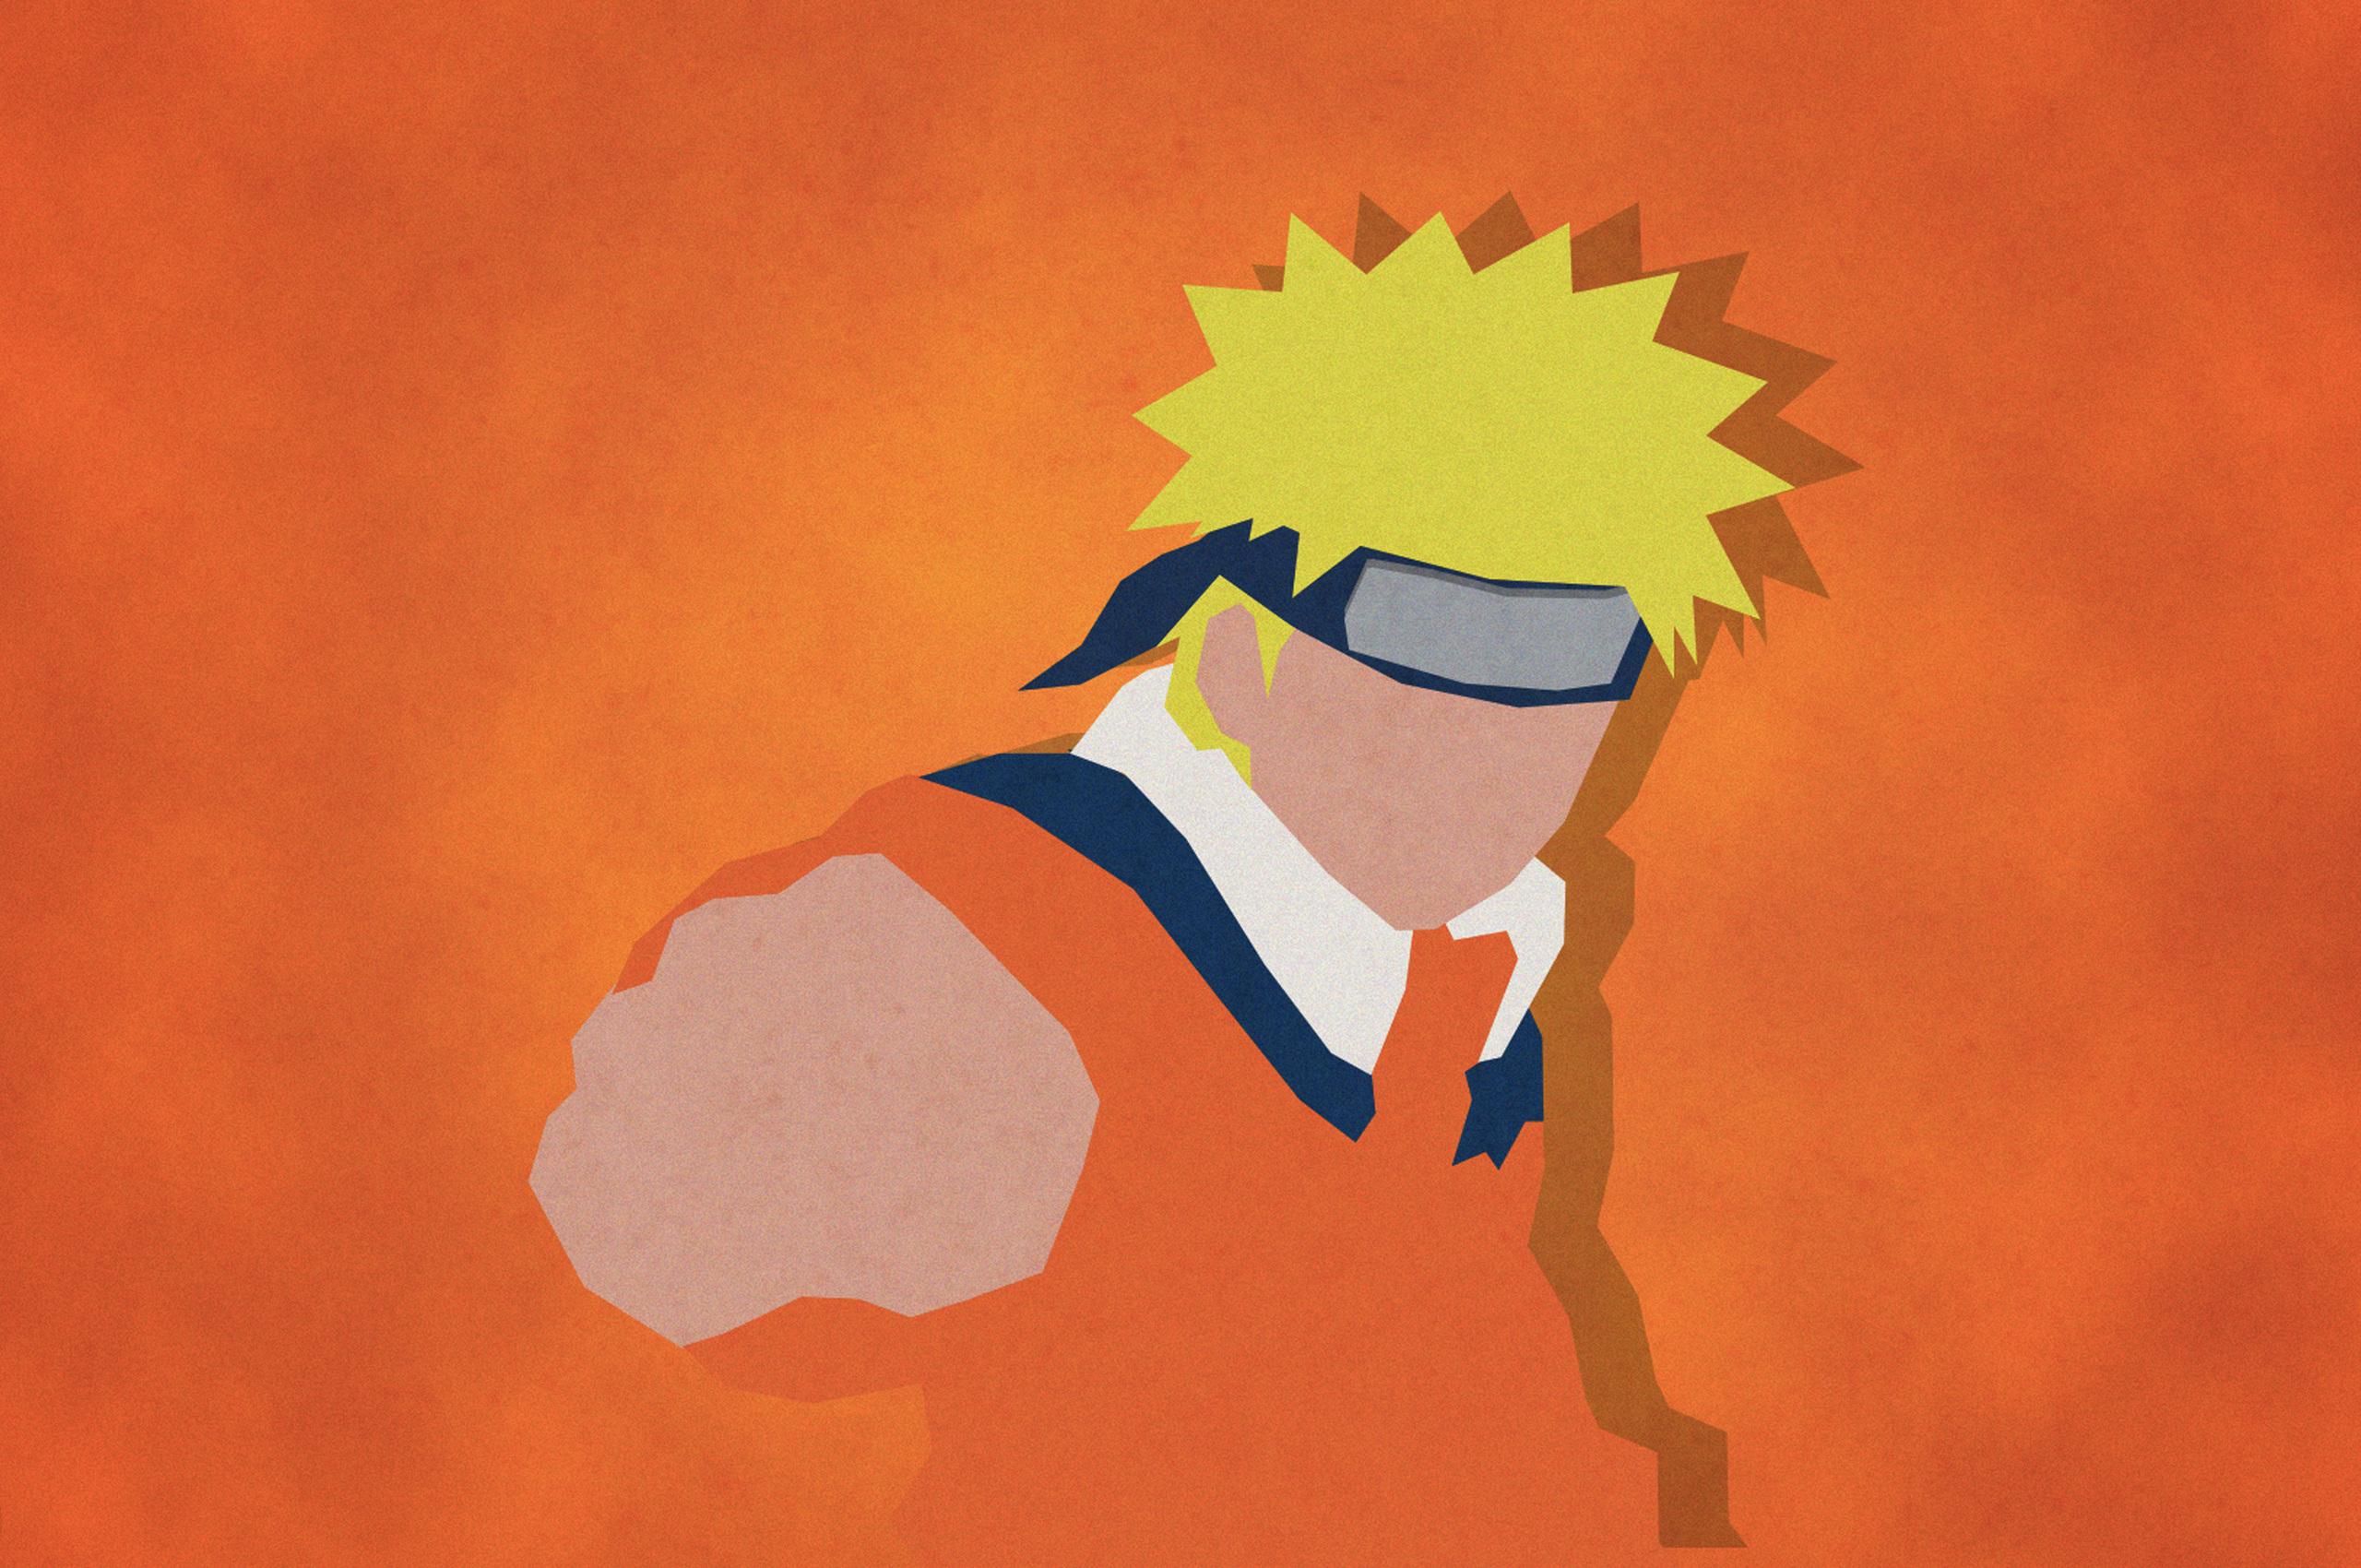 Cool Wallpaper Naruto Chromebook - uzumaki-naruto-shippuuden-minimalism-4k-ou-2560x1700  Picture_455482.jpg